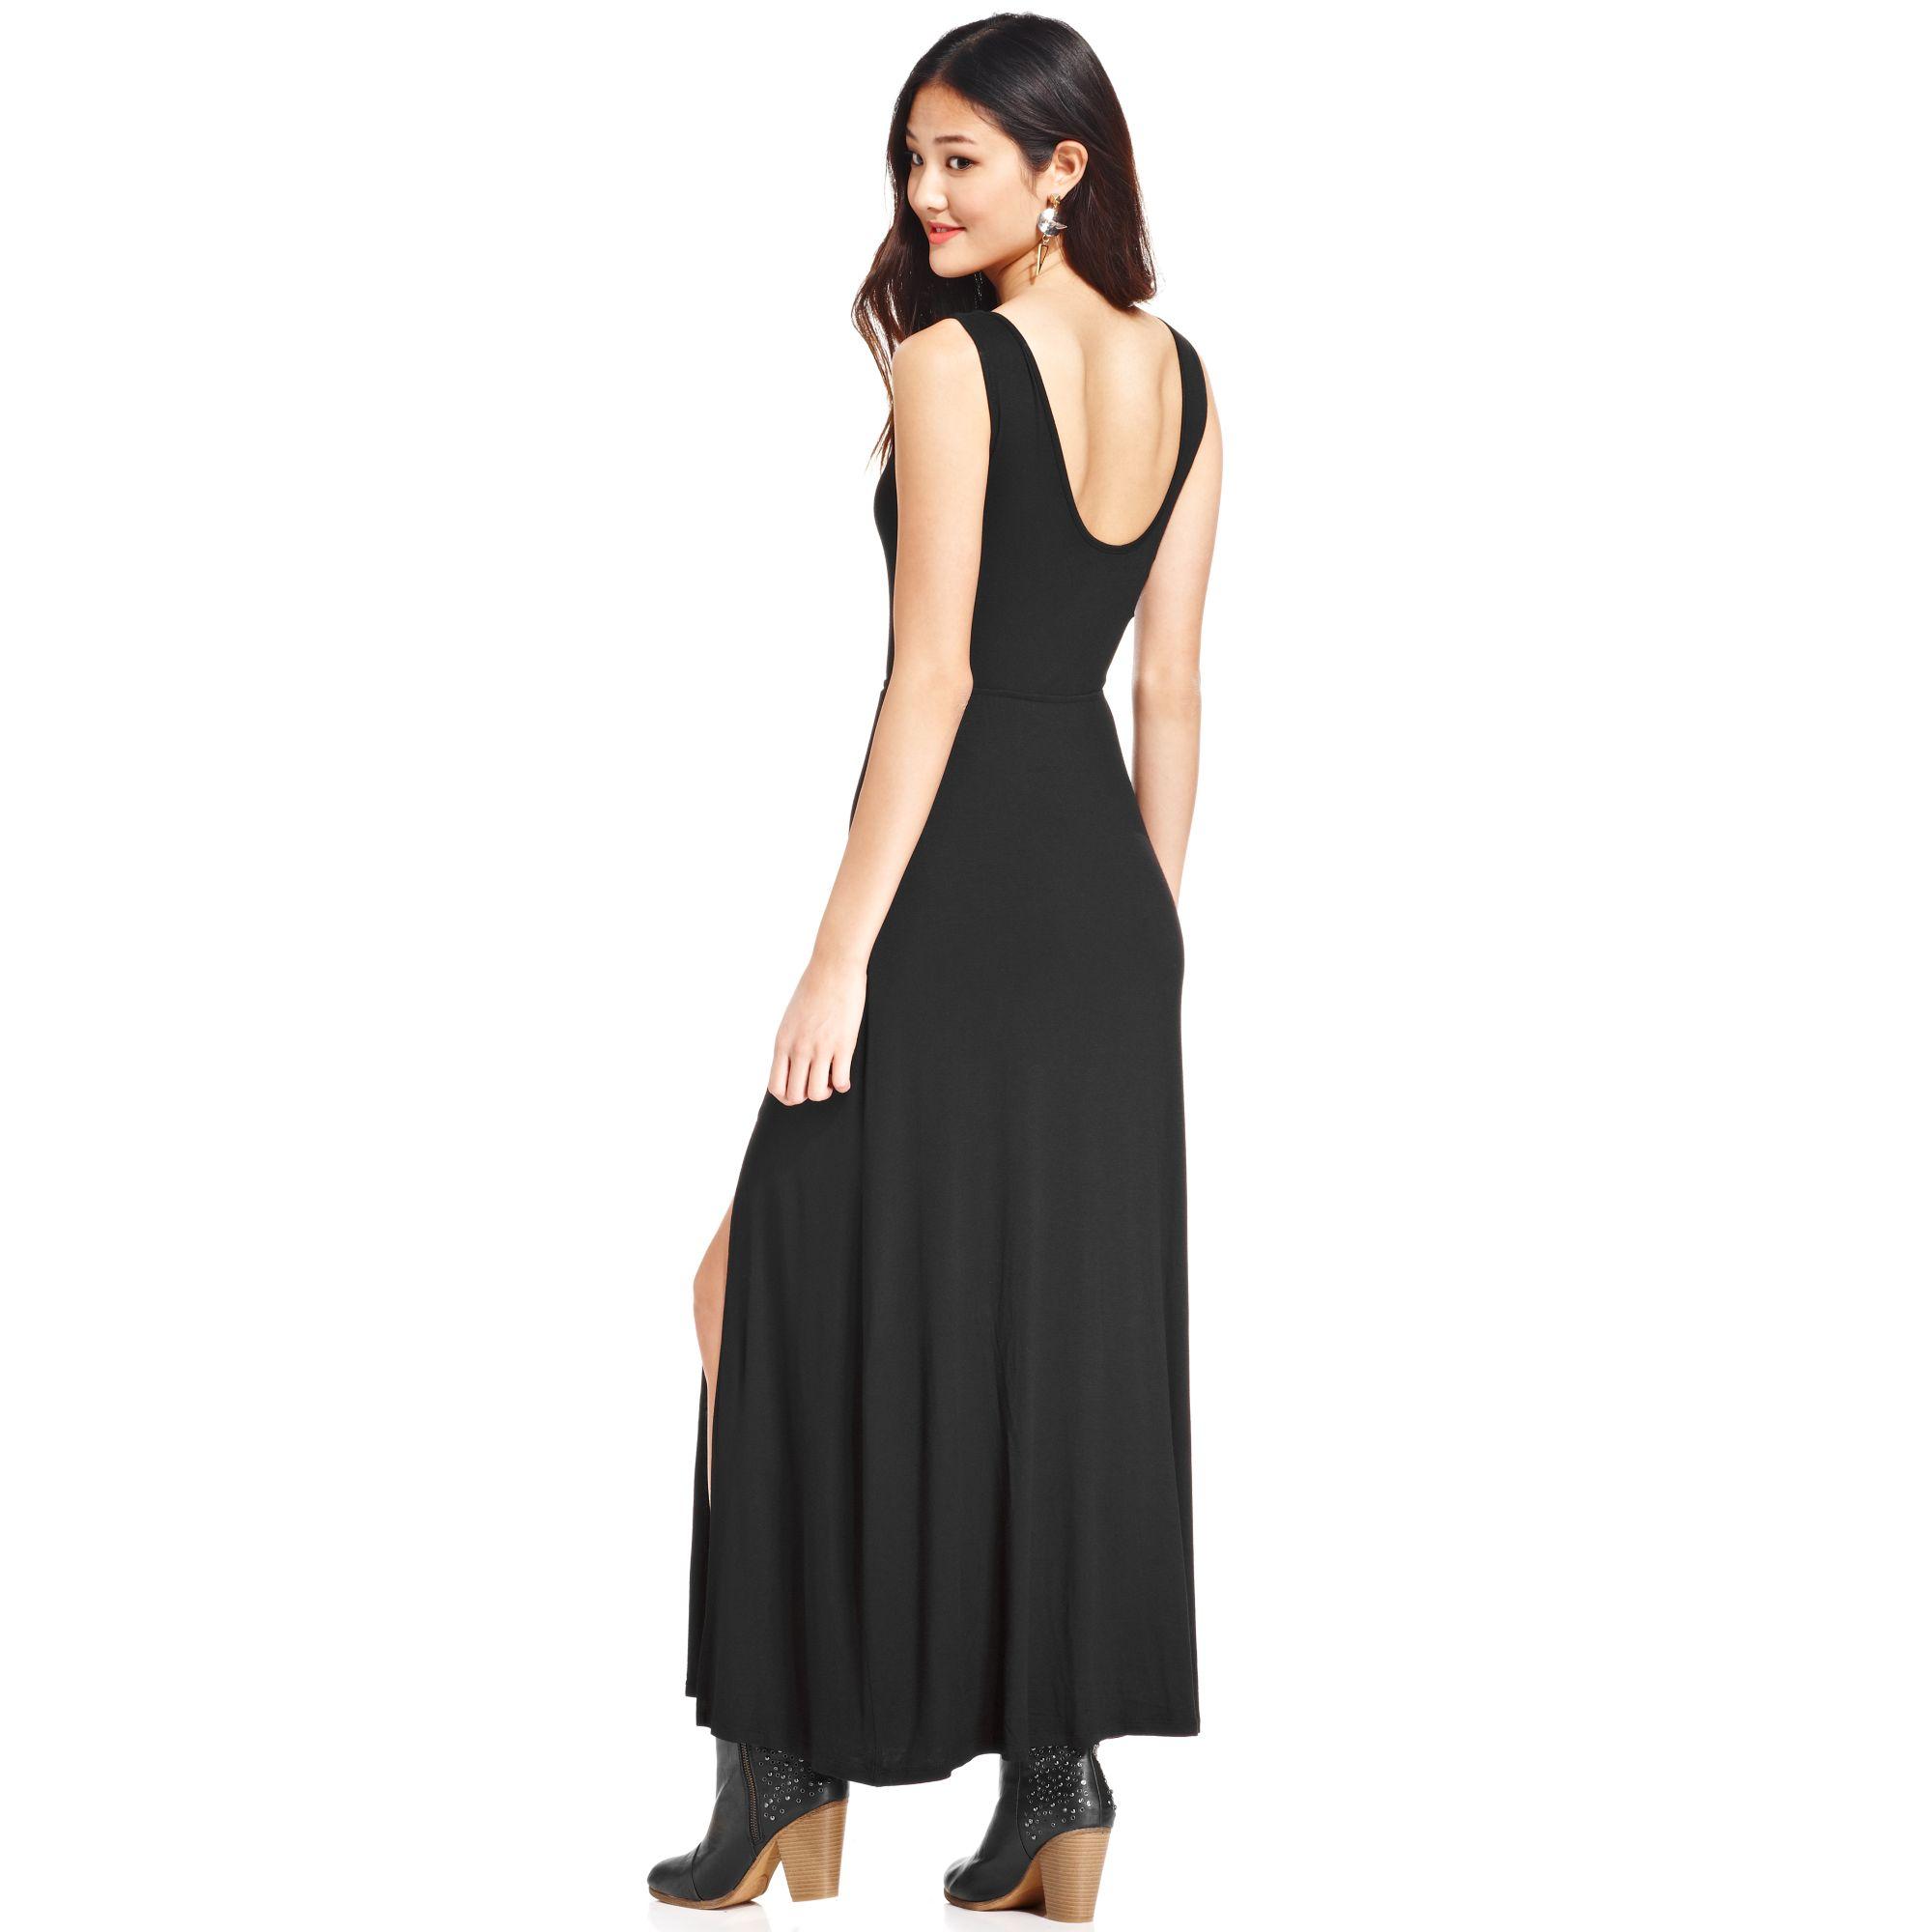 Material girl Juniors Illusion Maxi Dress in Black | Lyst